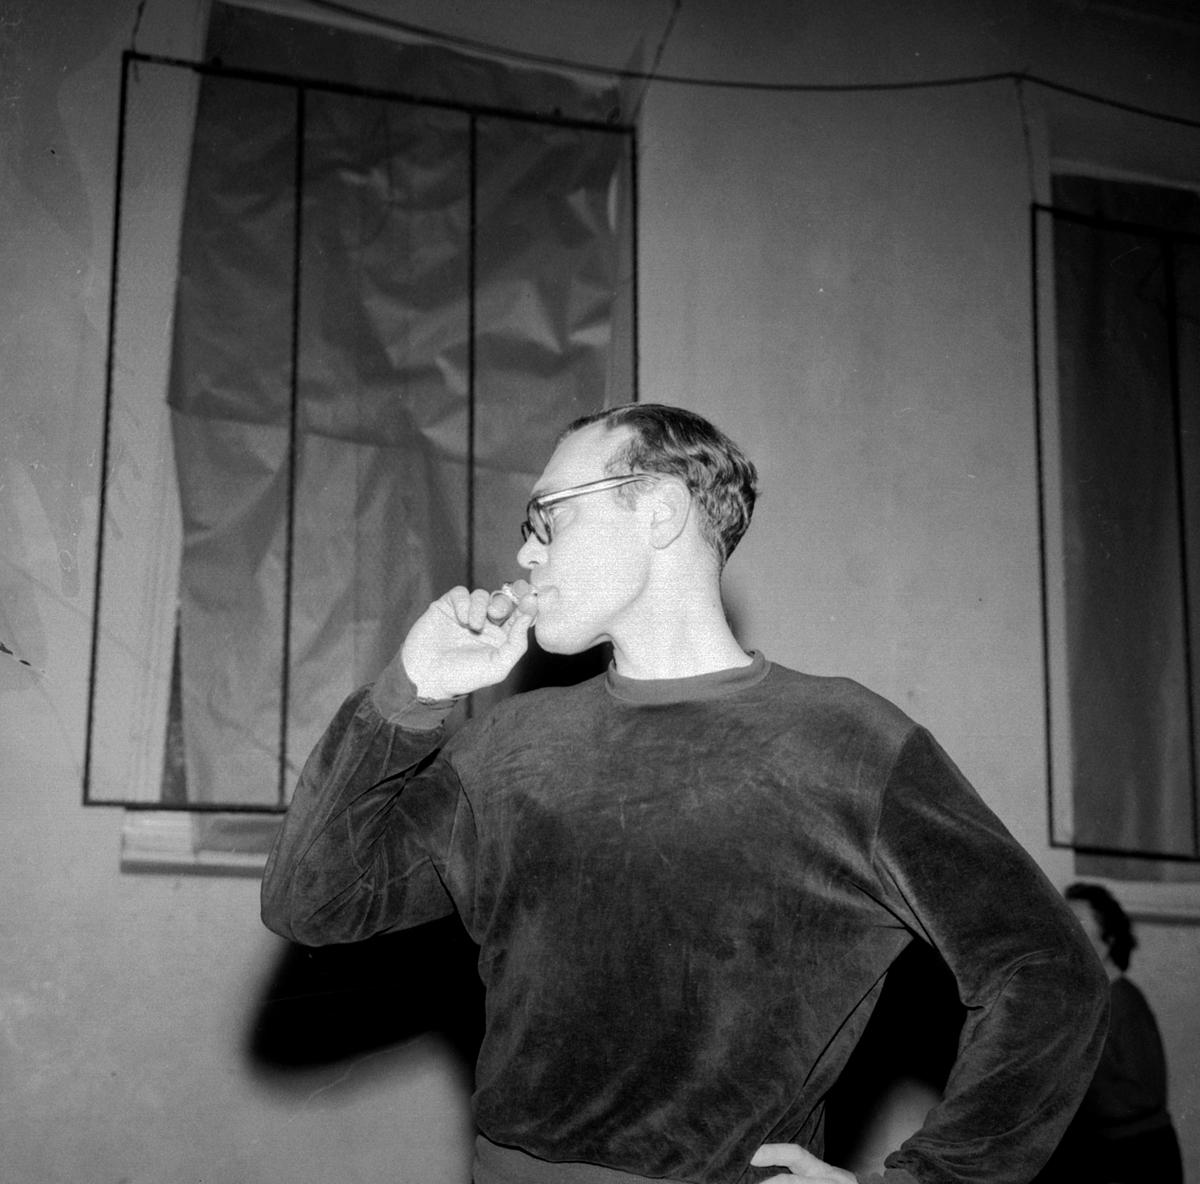 HÅNDBALLTRENER JOSTEIN KNUDSEN, HAMAR IL KOMMUNE: HAMAR DATO:19. 01. 1960 FOTO:EGIL M. KRISTIANSEN